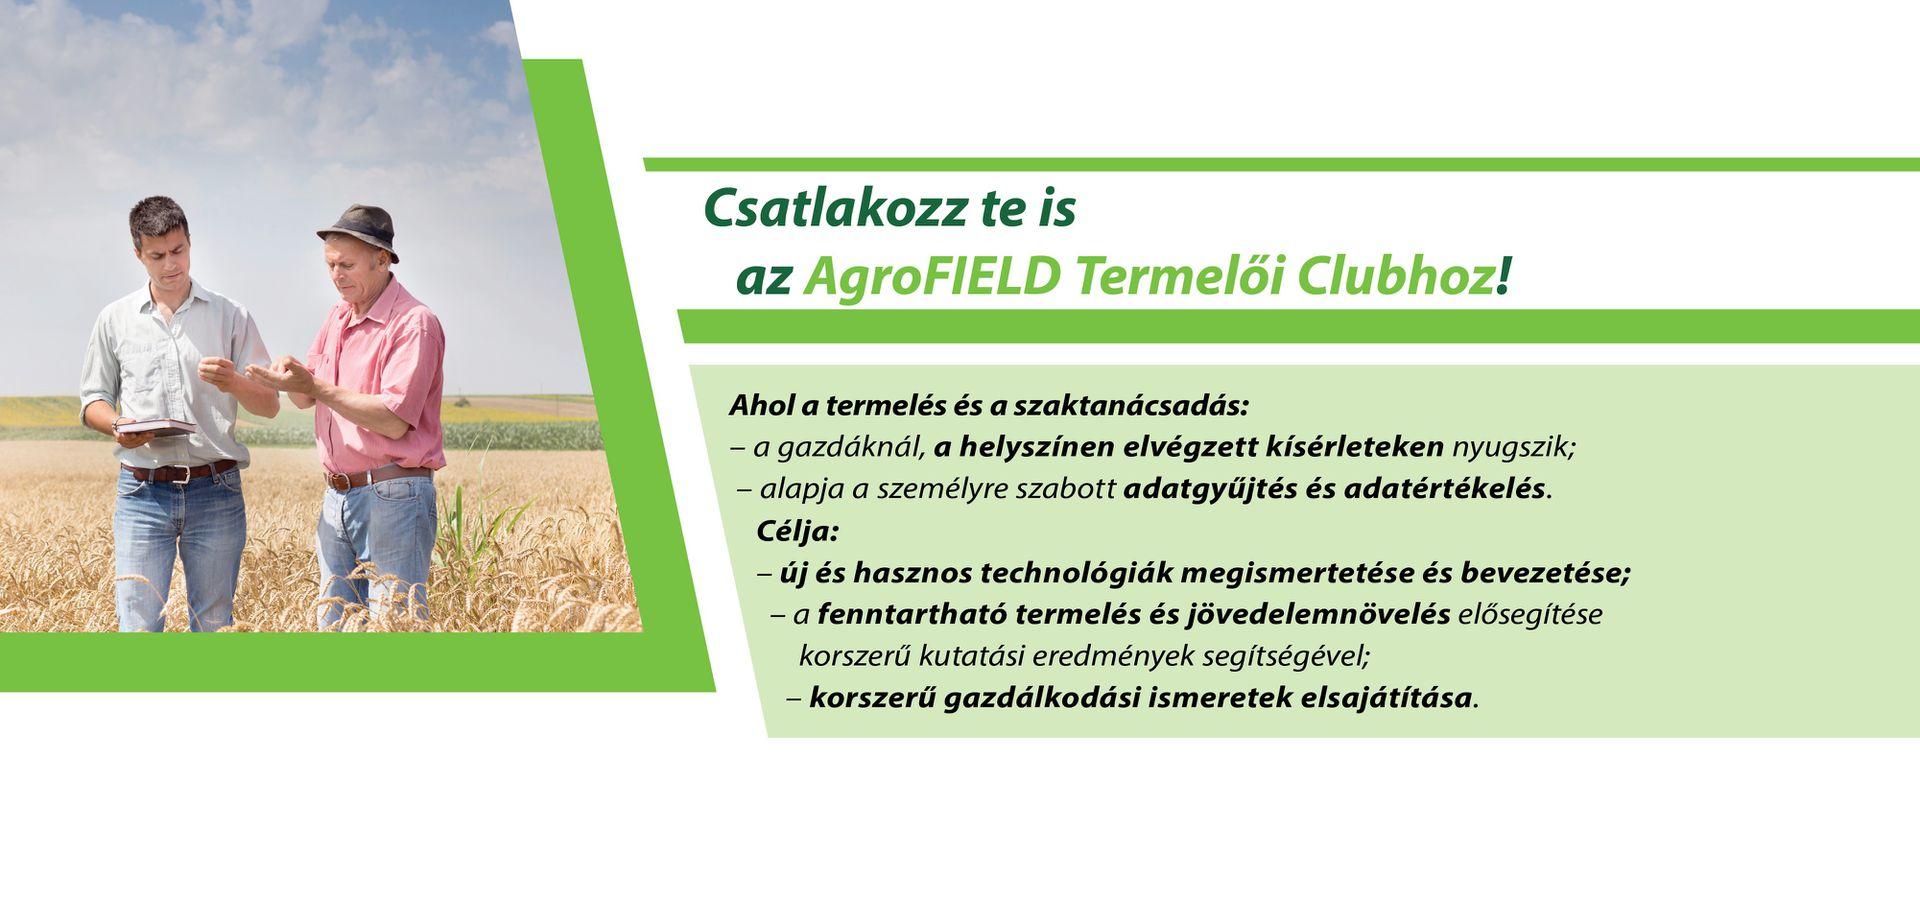 AgroFIELD Termelői Club